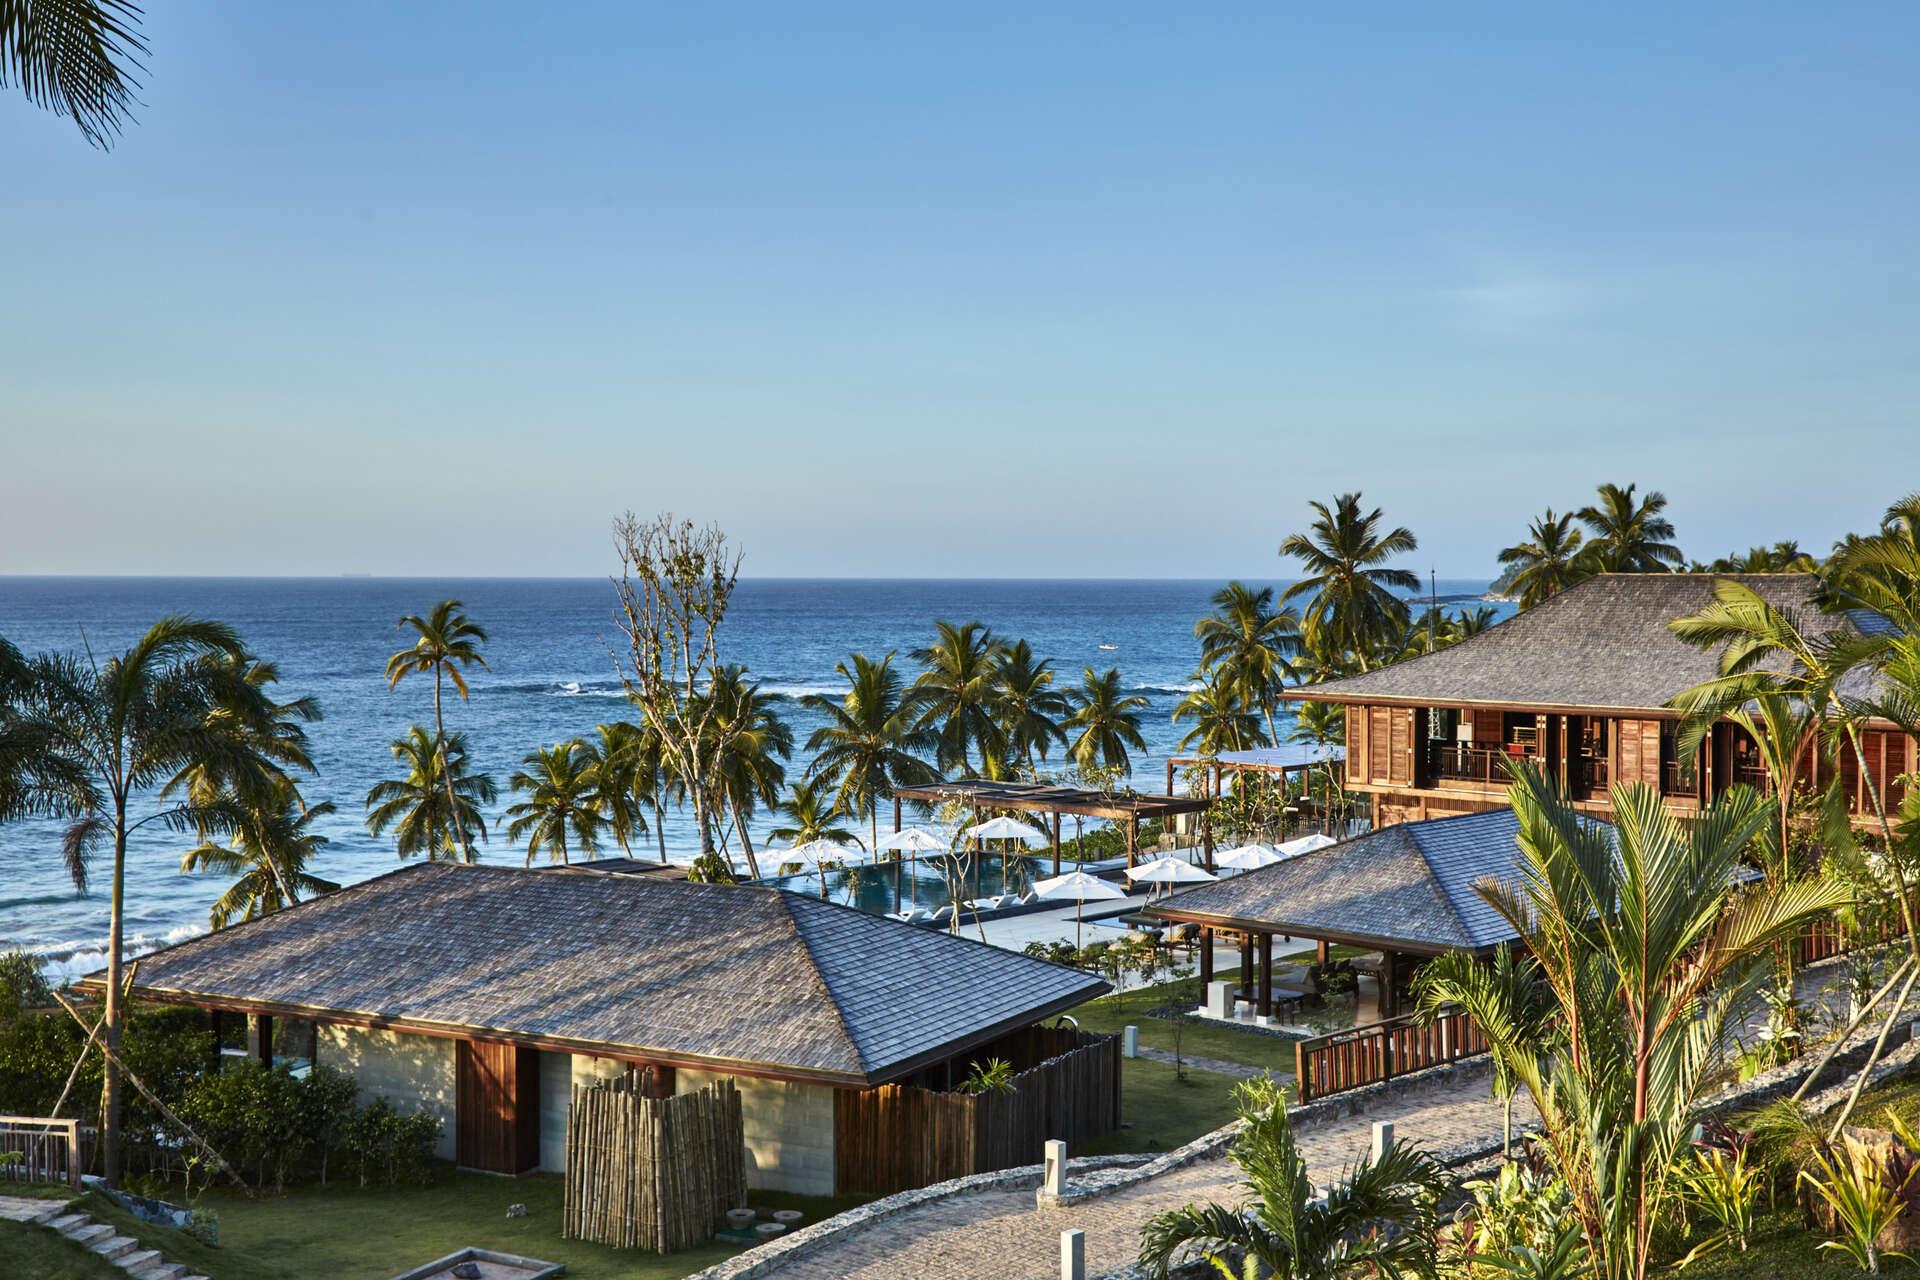 Luxury villa rentals asia - Sri lanka - Maliyadda - No location 4 - Ani Sri Lanka - Image 1/24